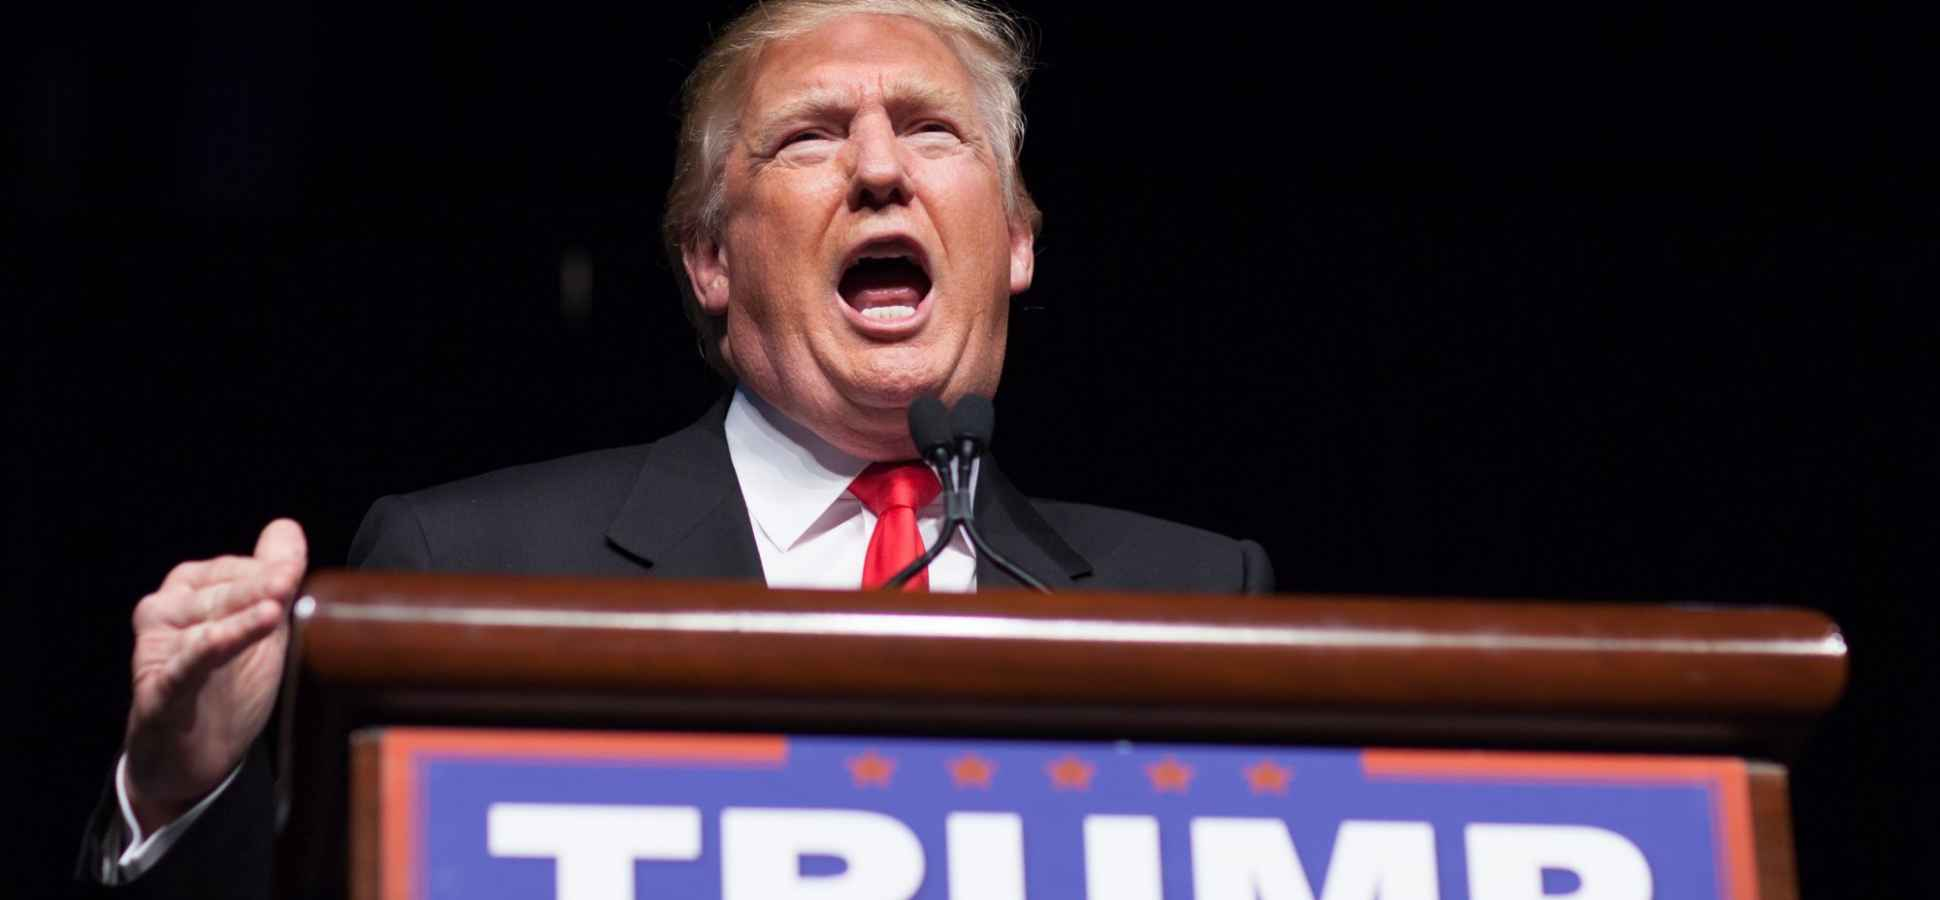 7 Reasons the Trump Machine Keeps Winning